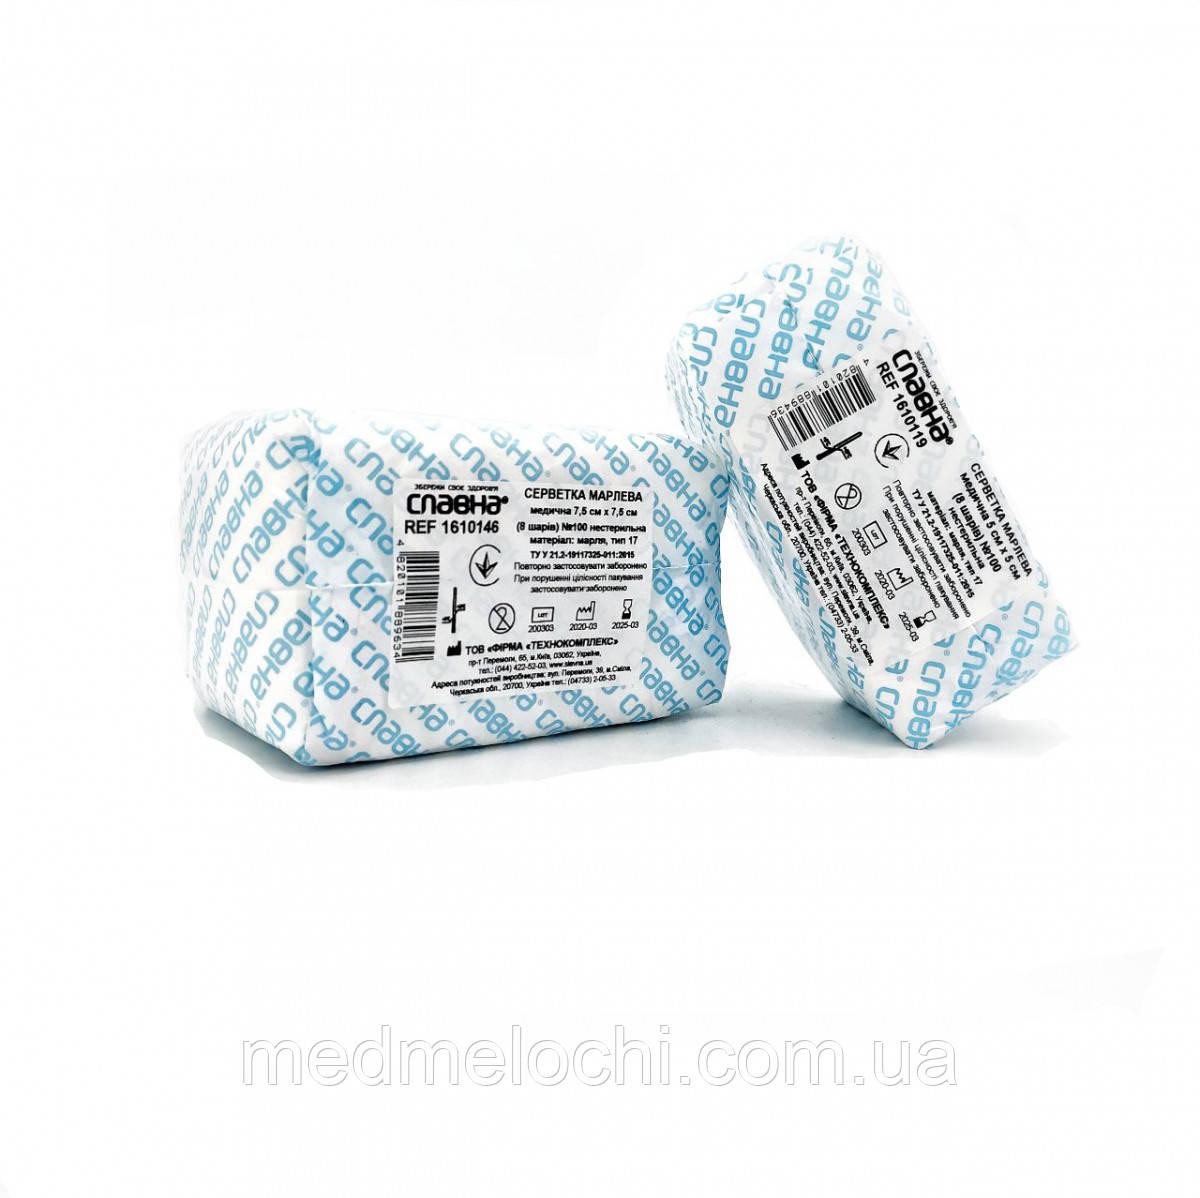 Серветка марлева нестерильна 7,5 х 7,5 см, 8 шарів, 100 шт/уп